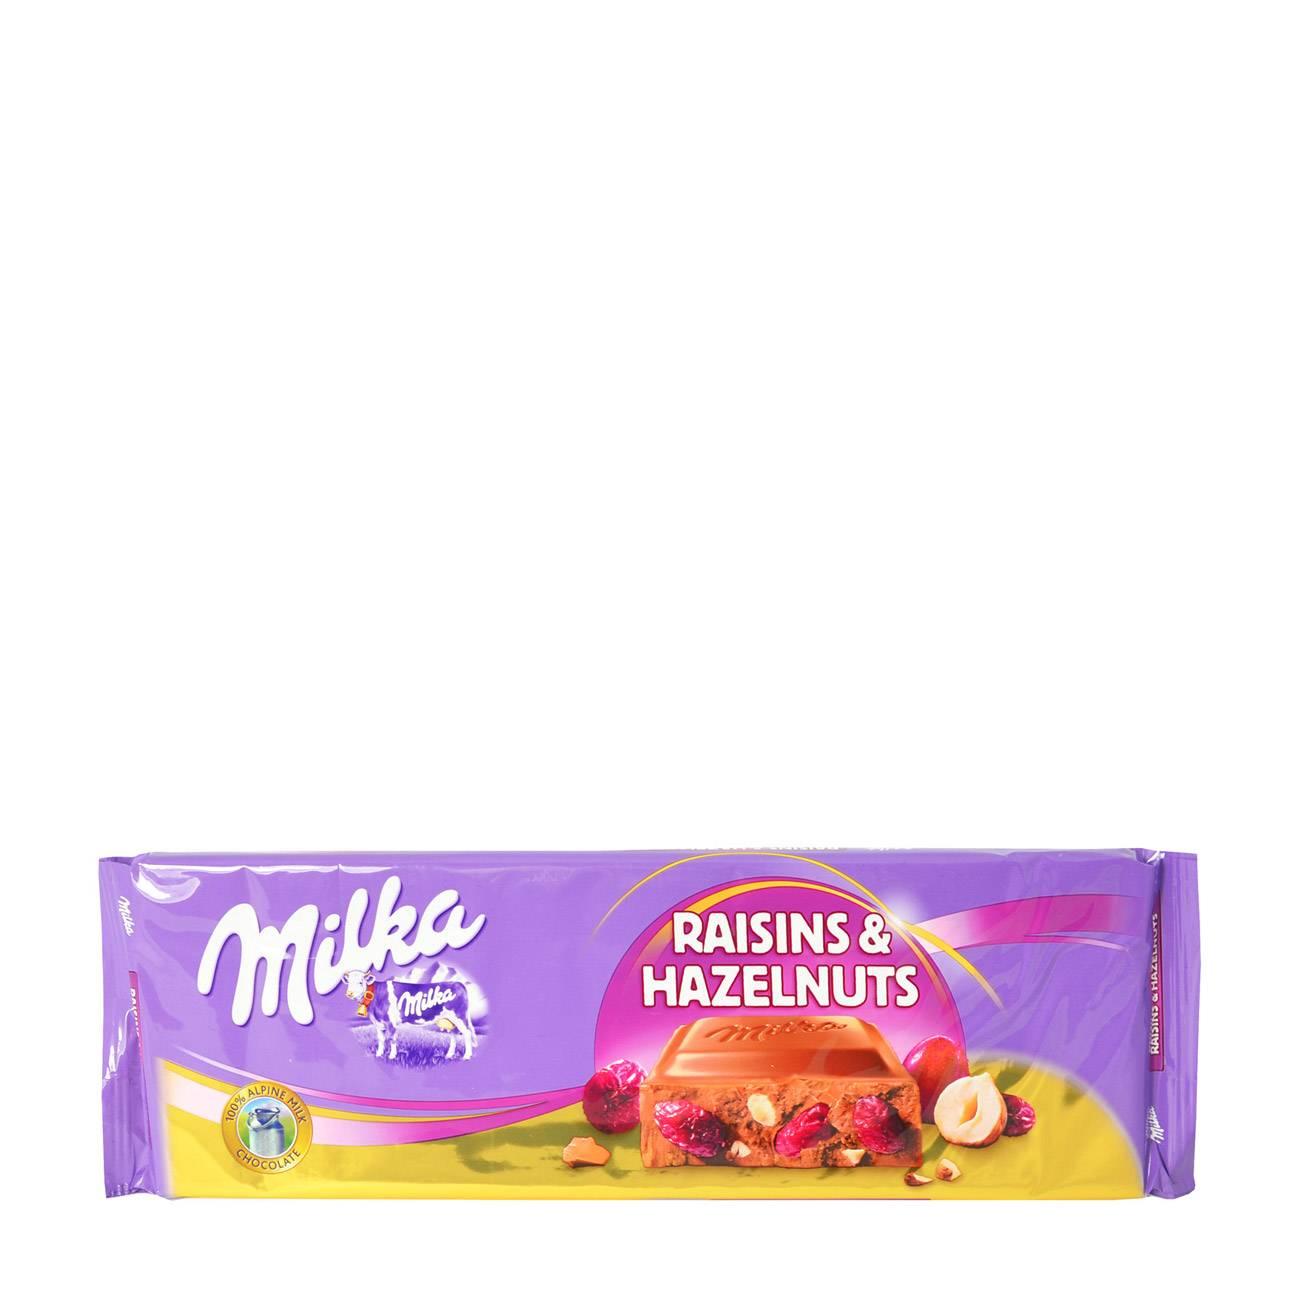 RAISINS & HAZELNUTS 270 Grame